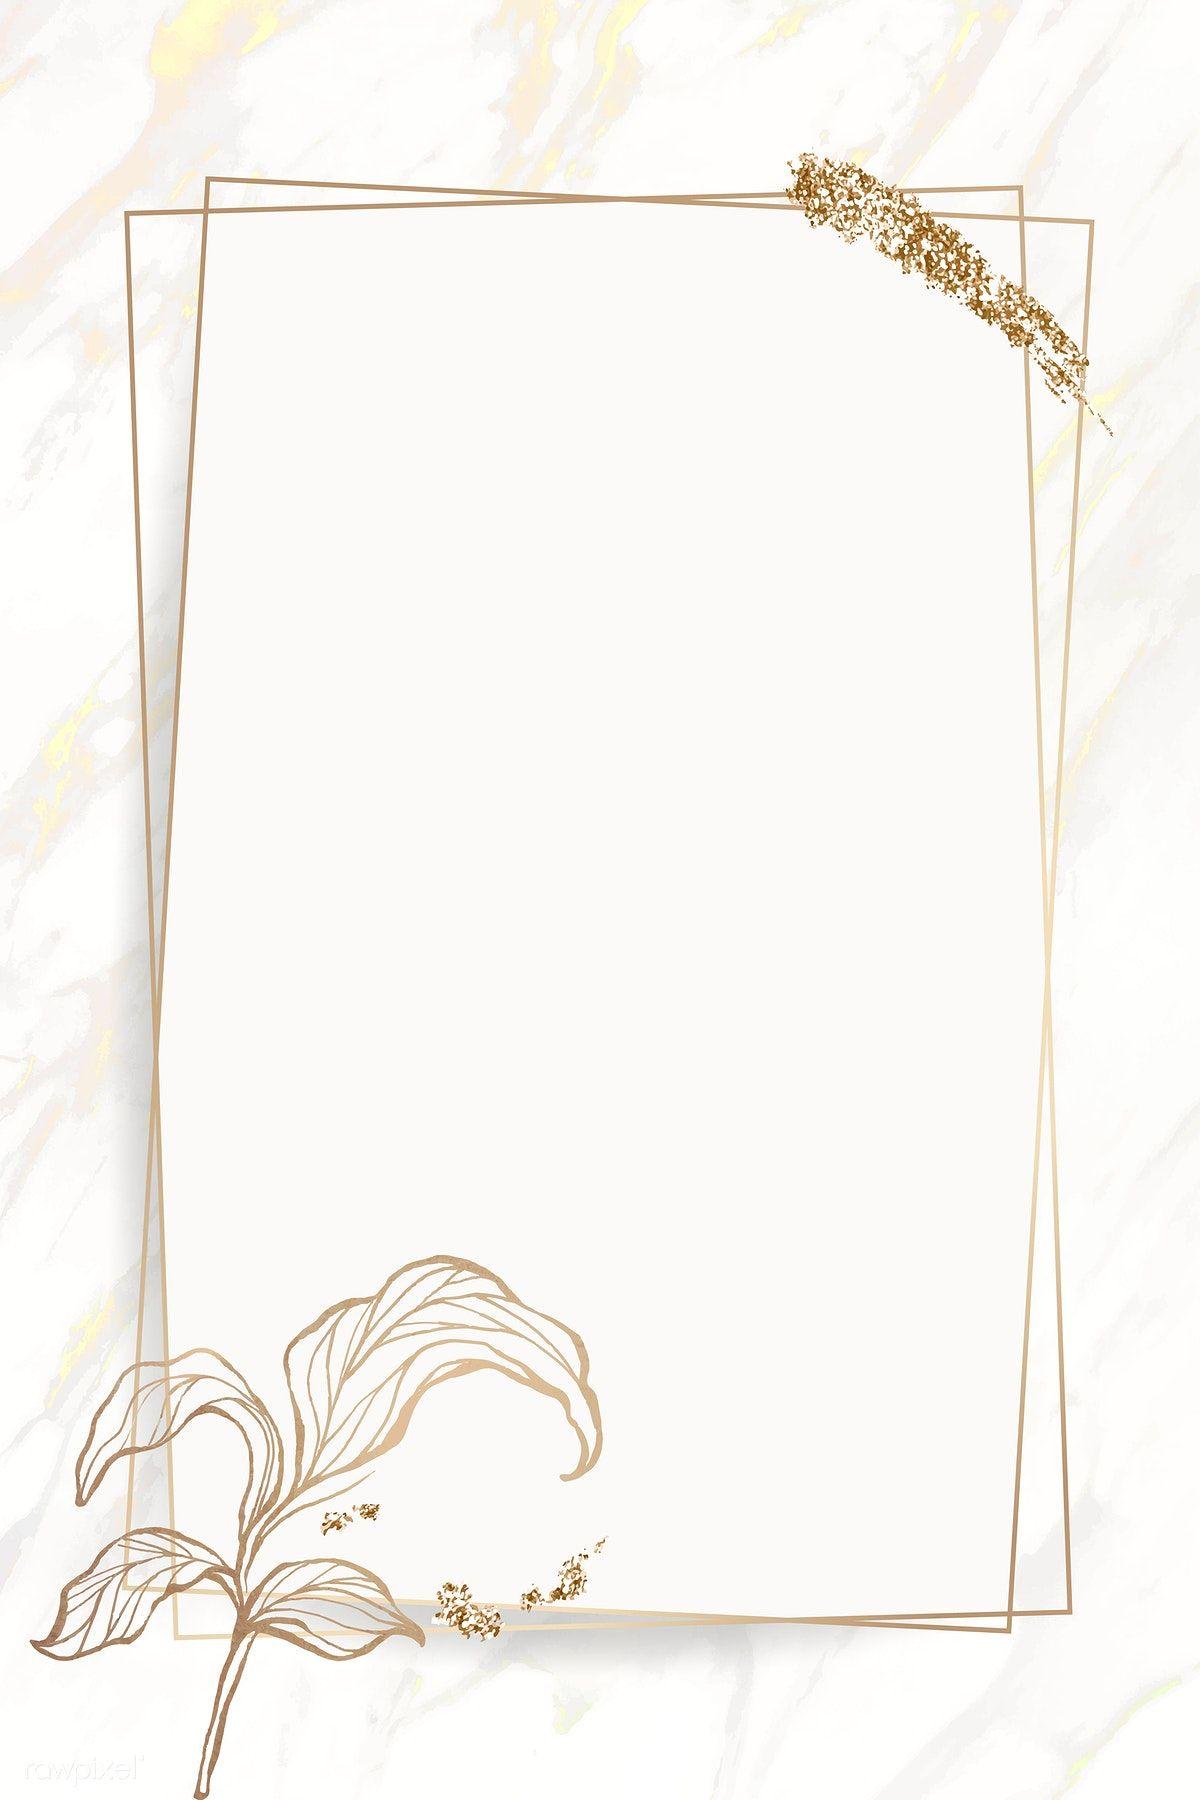 Download Premium Vector Of Gold Leaves Frame With Brush Stoke Vector Frame Border Design Flower Background Wallpaper Pink And Gold Wallpaper